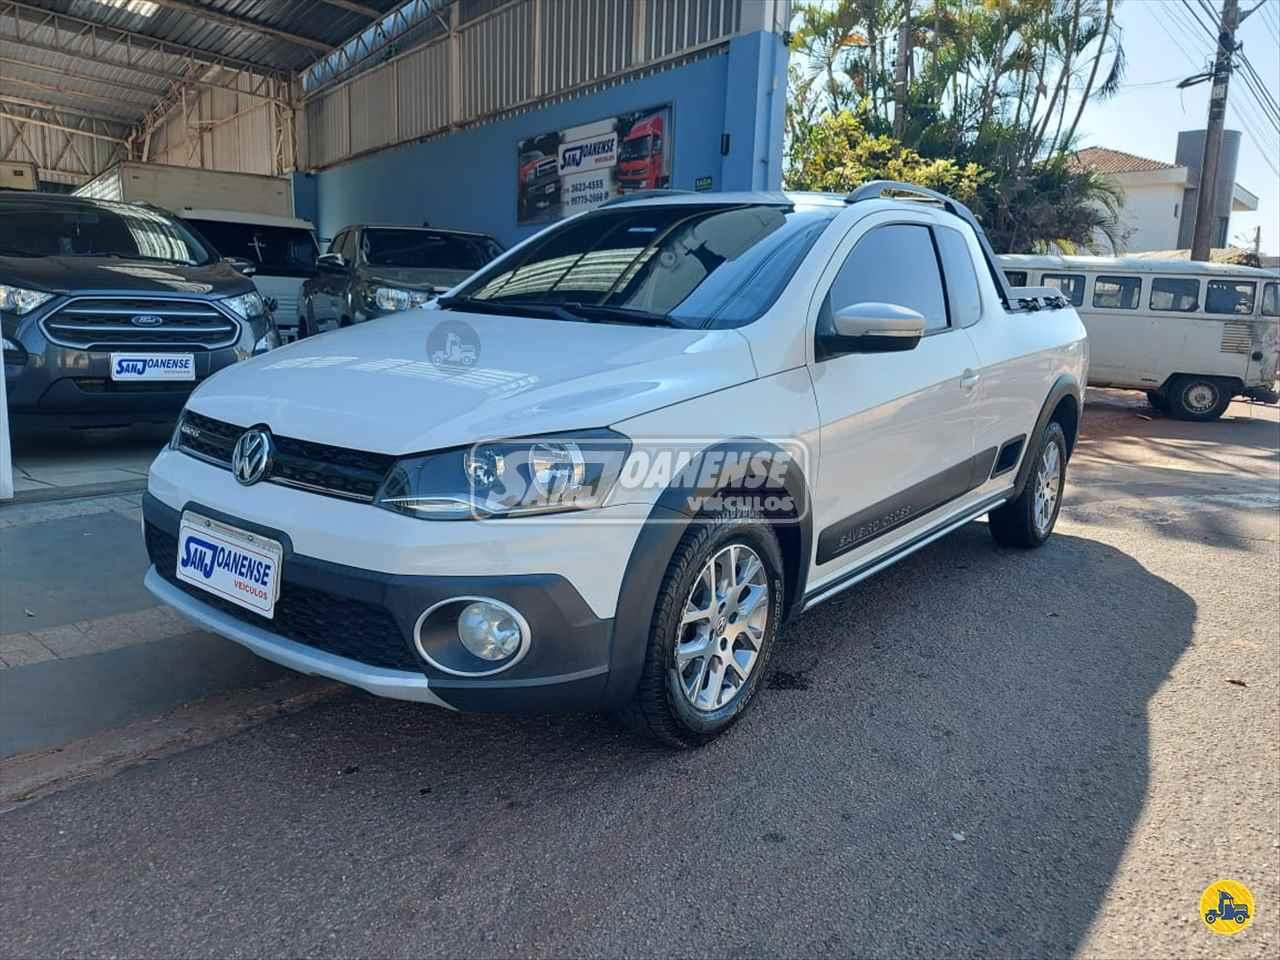 CARRO VW - Volkswagen Saveiro 1.6 CE Cross Sanjoanense Veículos SAO JOAO DA BOA VISTA SÃO PAULO SP